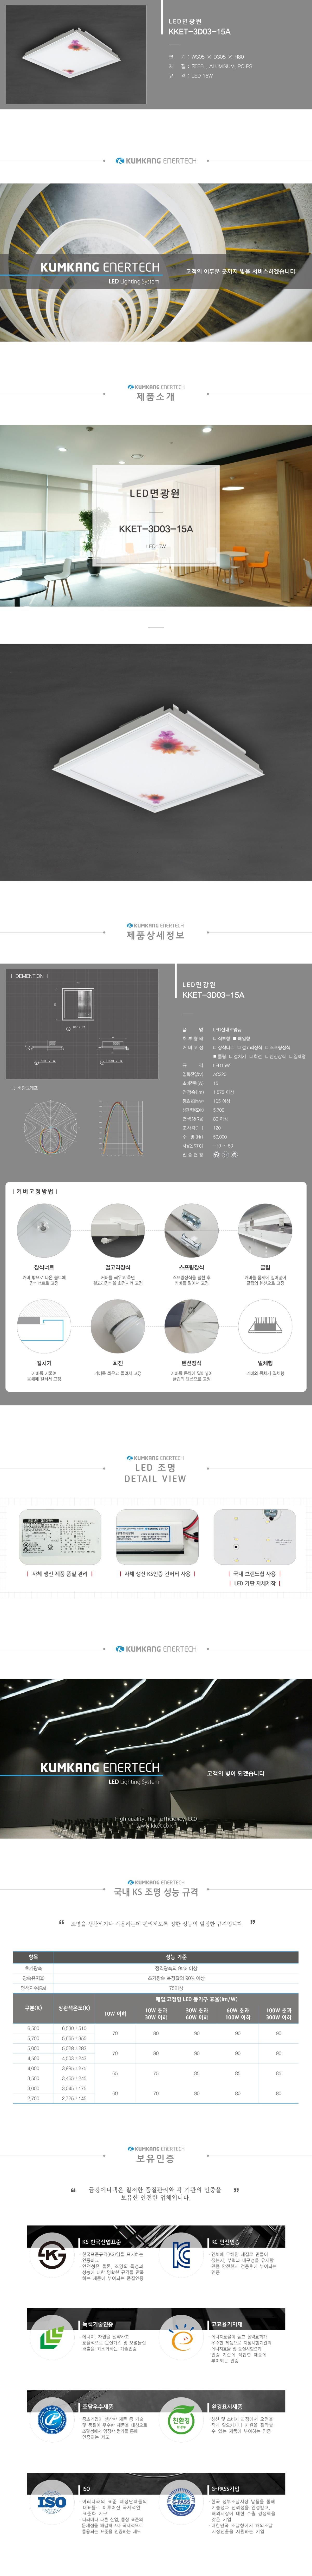 KKET-3D03-15A-01-01.jpg